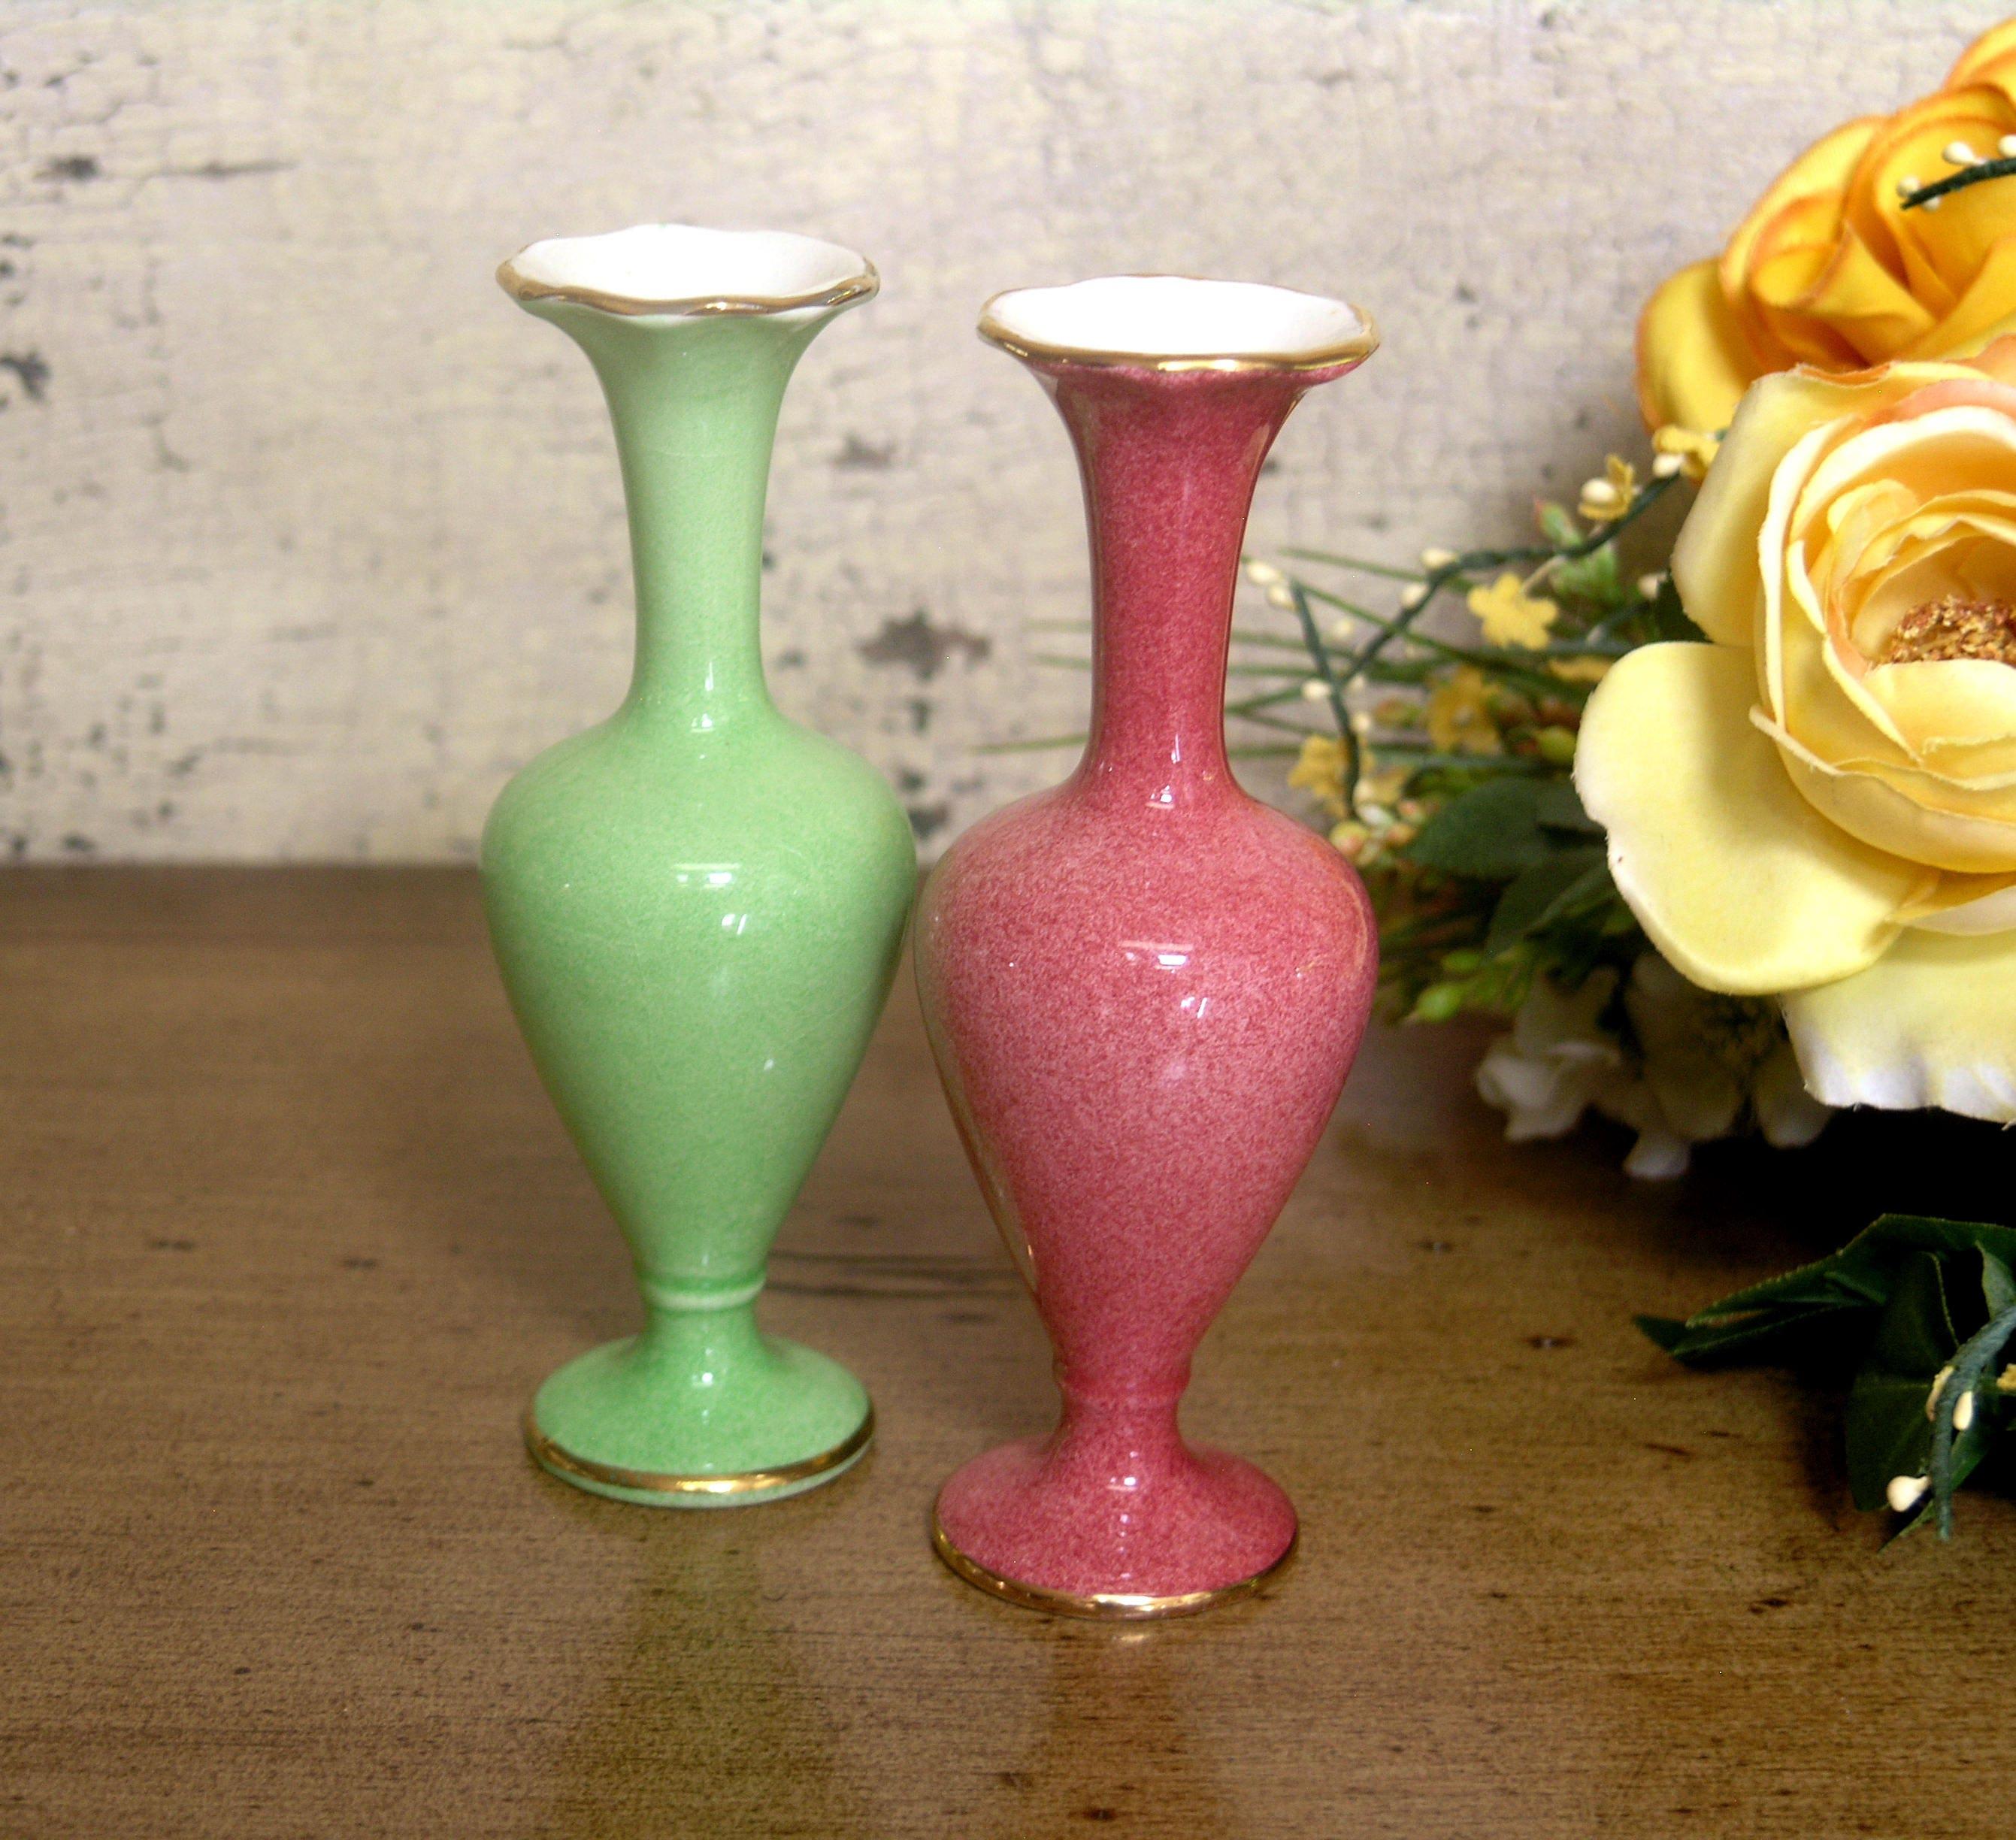 Antique royal winton grimwades pair of porcelain bud vases one antique royal winton grimwades pair of porcelain bud vases one pink and one green gold trim reviewsmspy